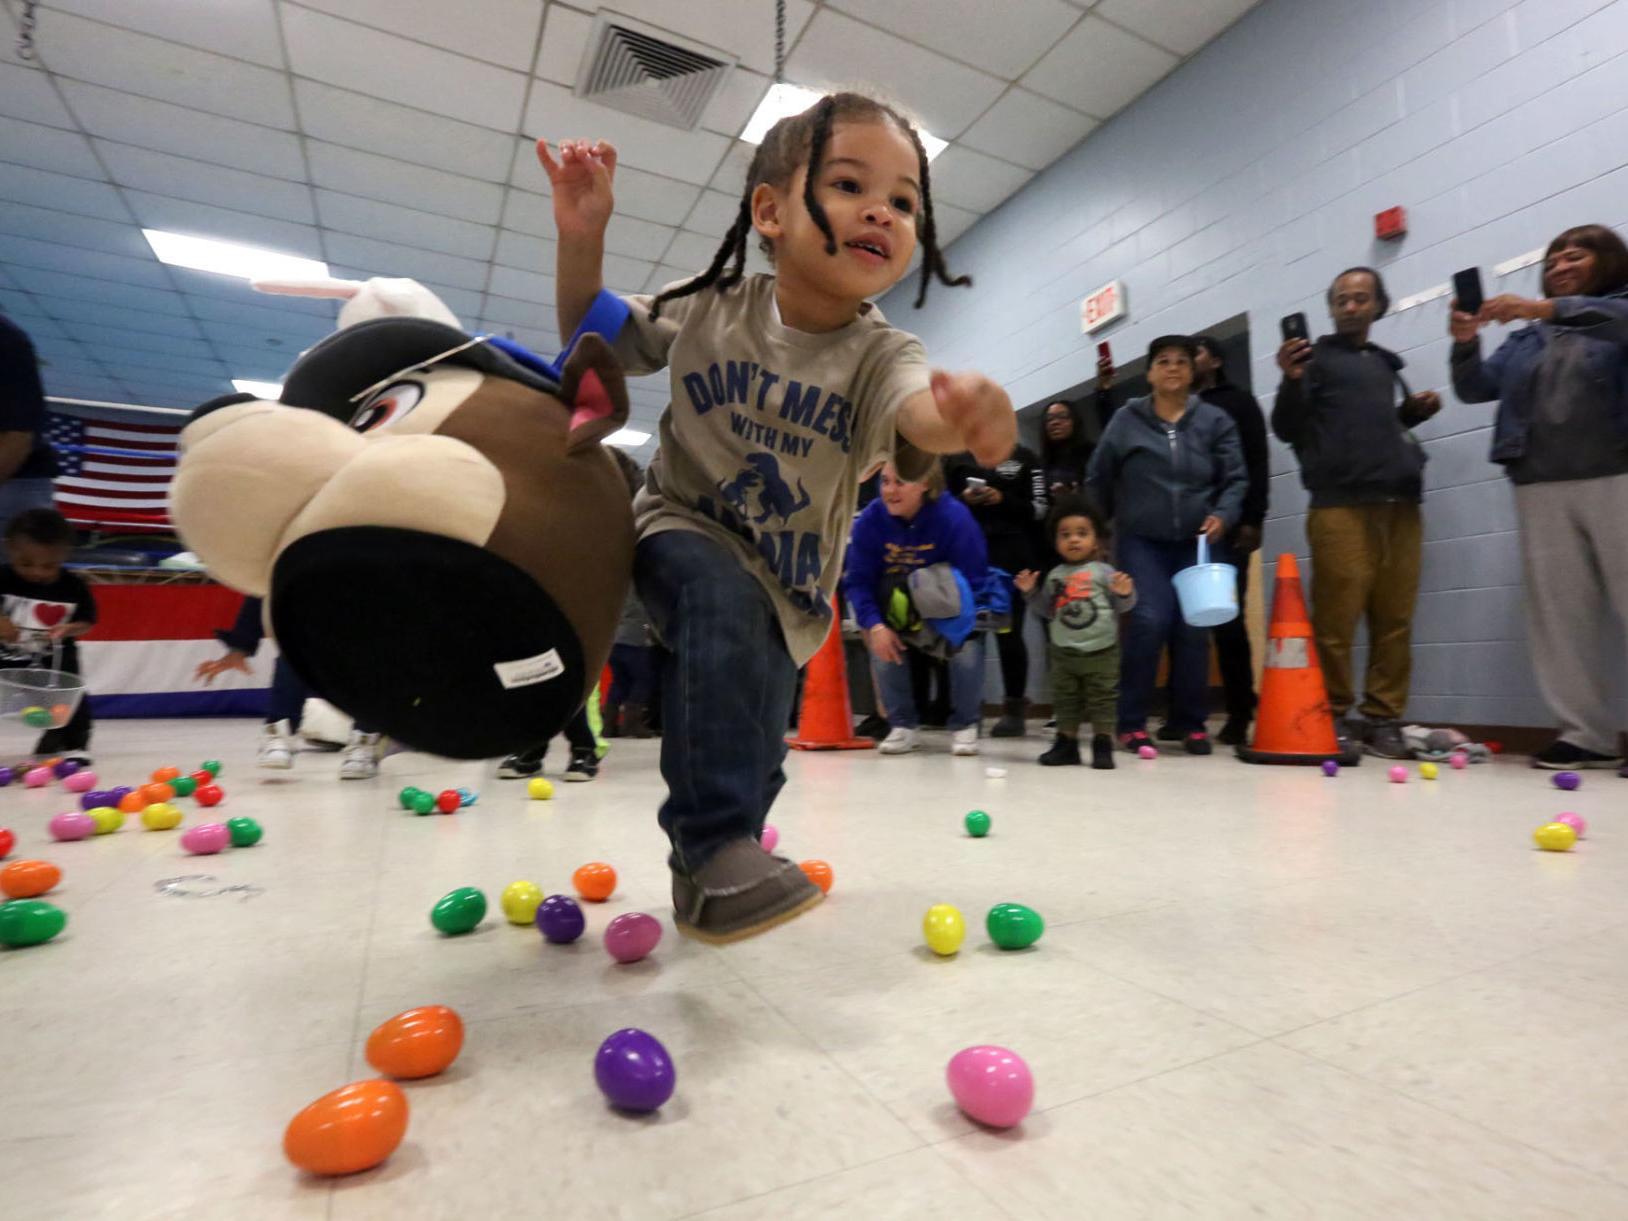 PHOTOS from Pleasantville's Easter egg hunt